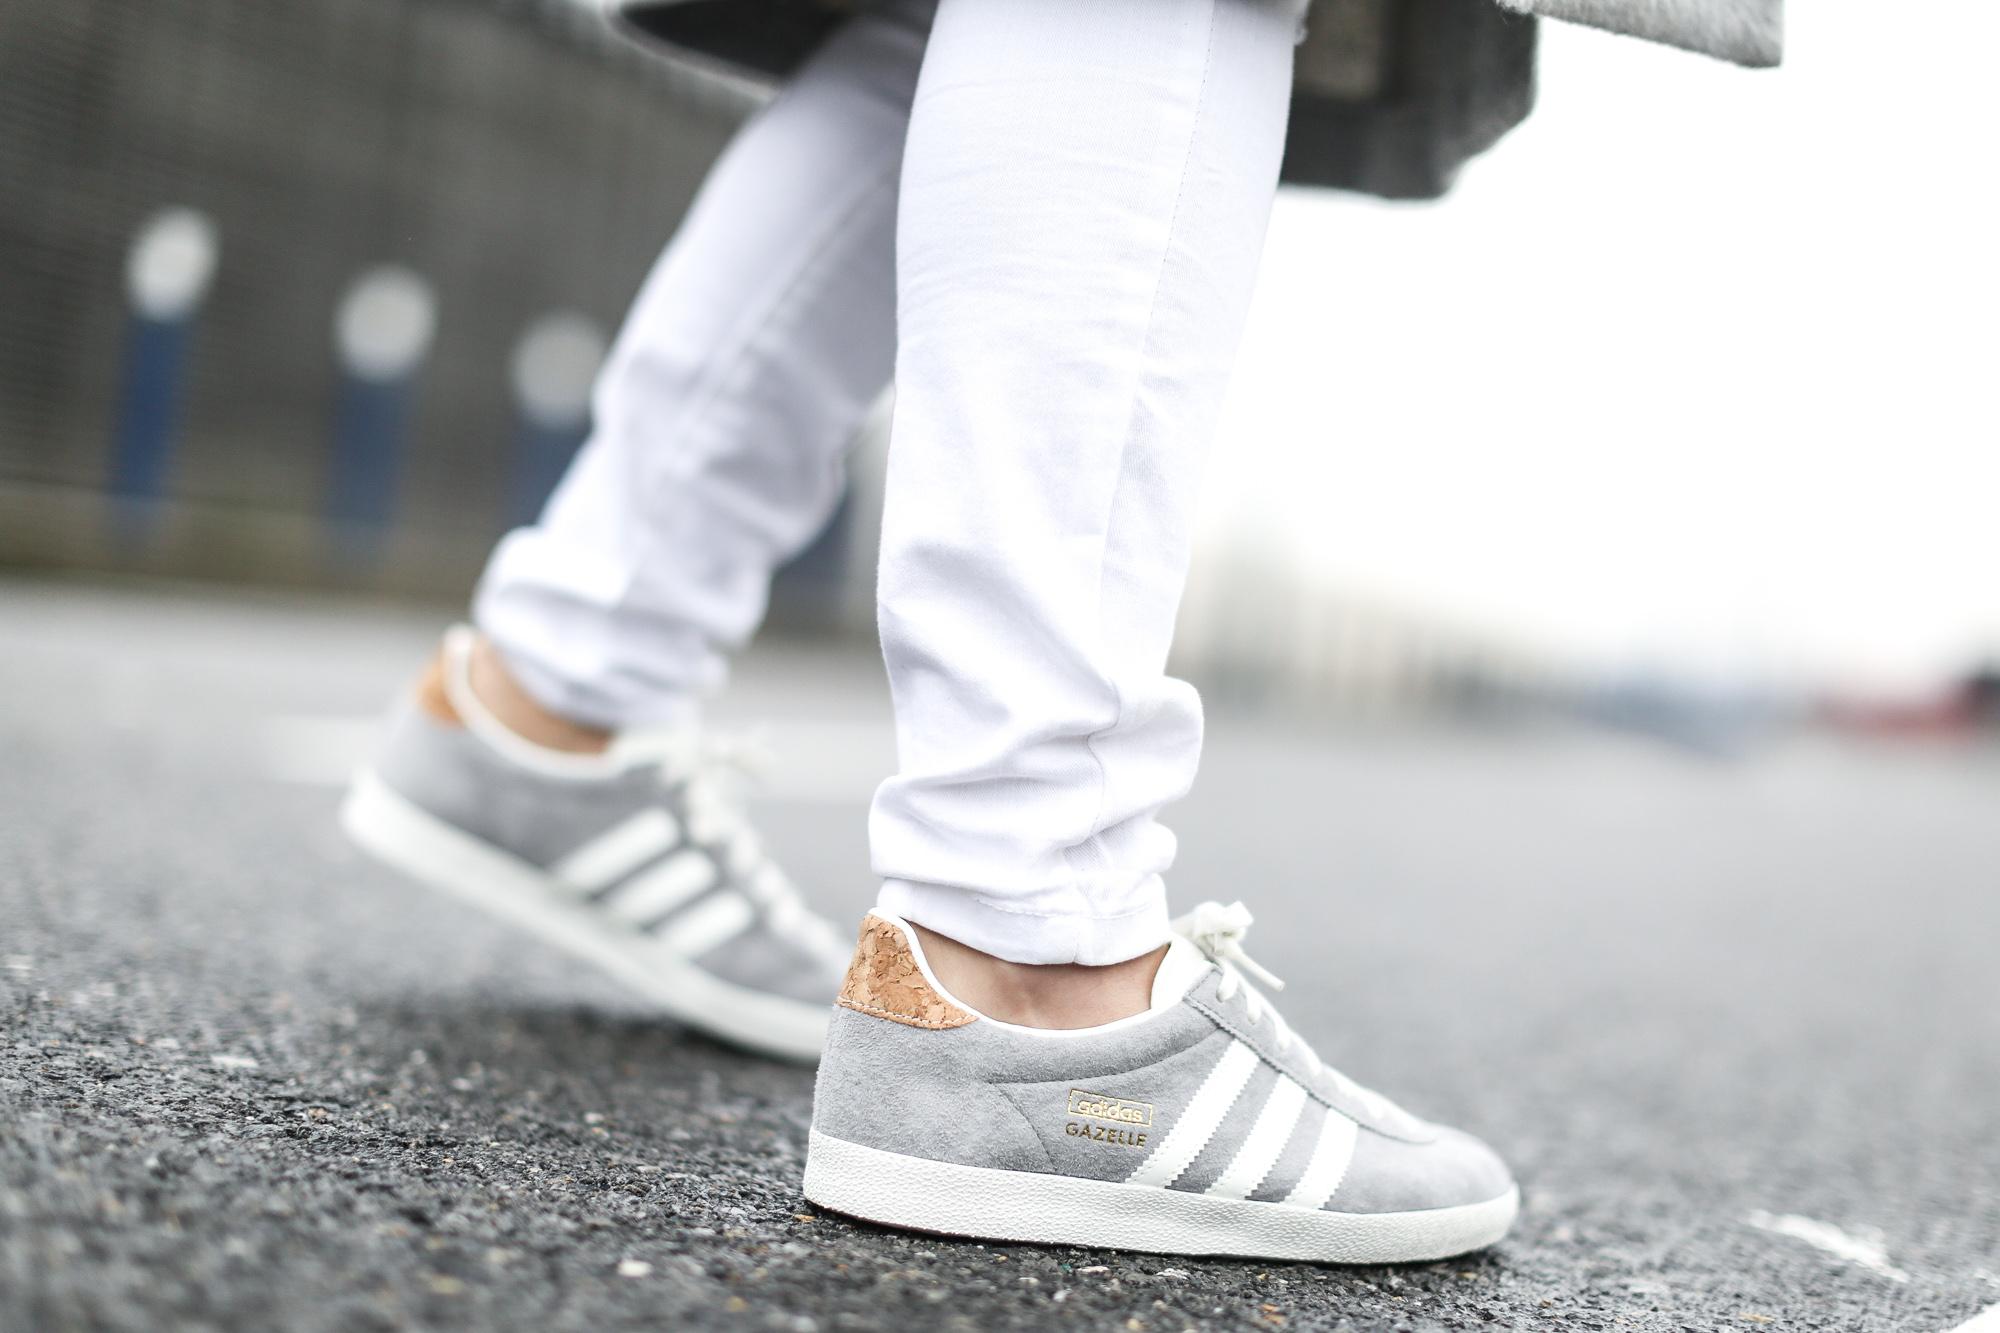 Clochet-streetstyle-leztinstreet-adidas-gazelle-vintage-retro-9